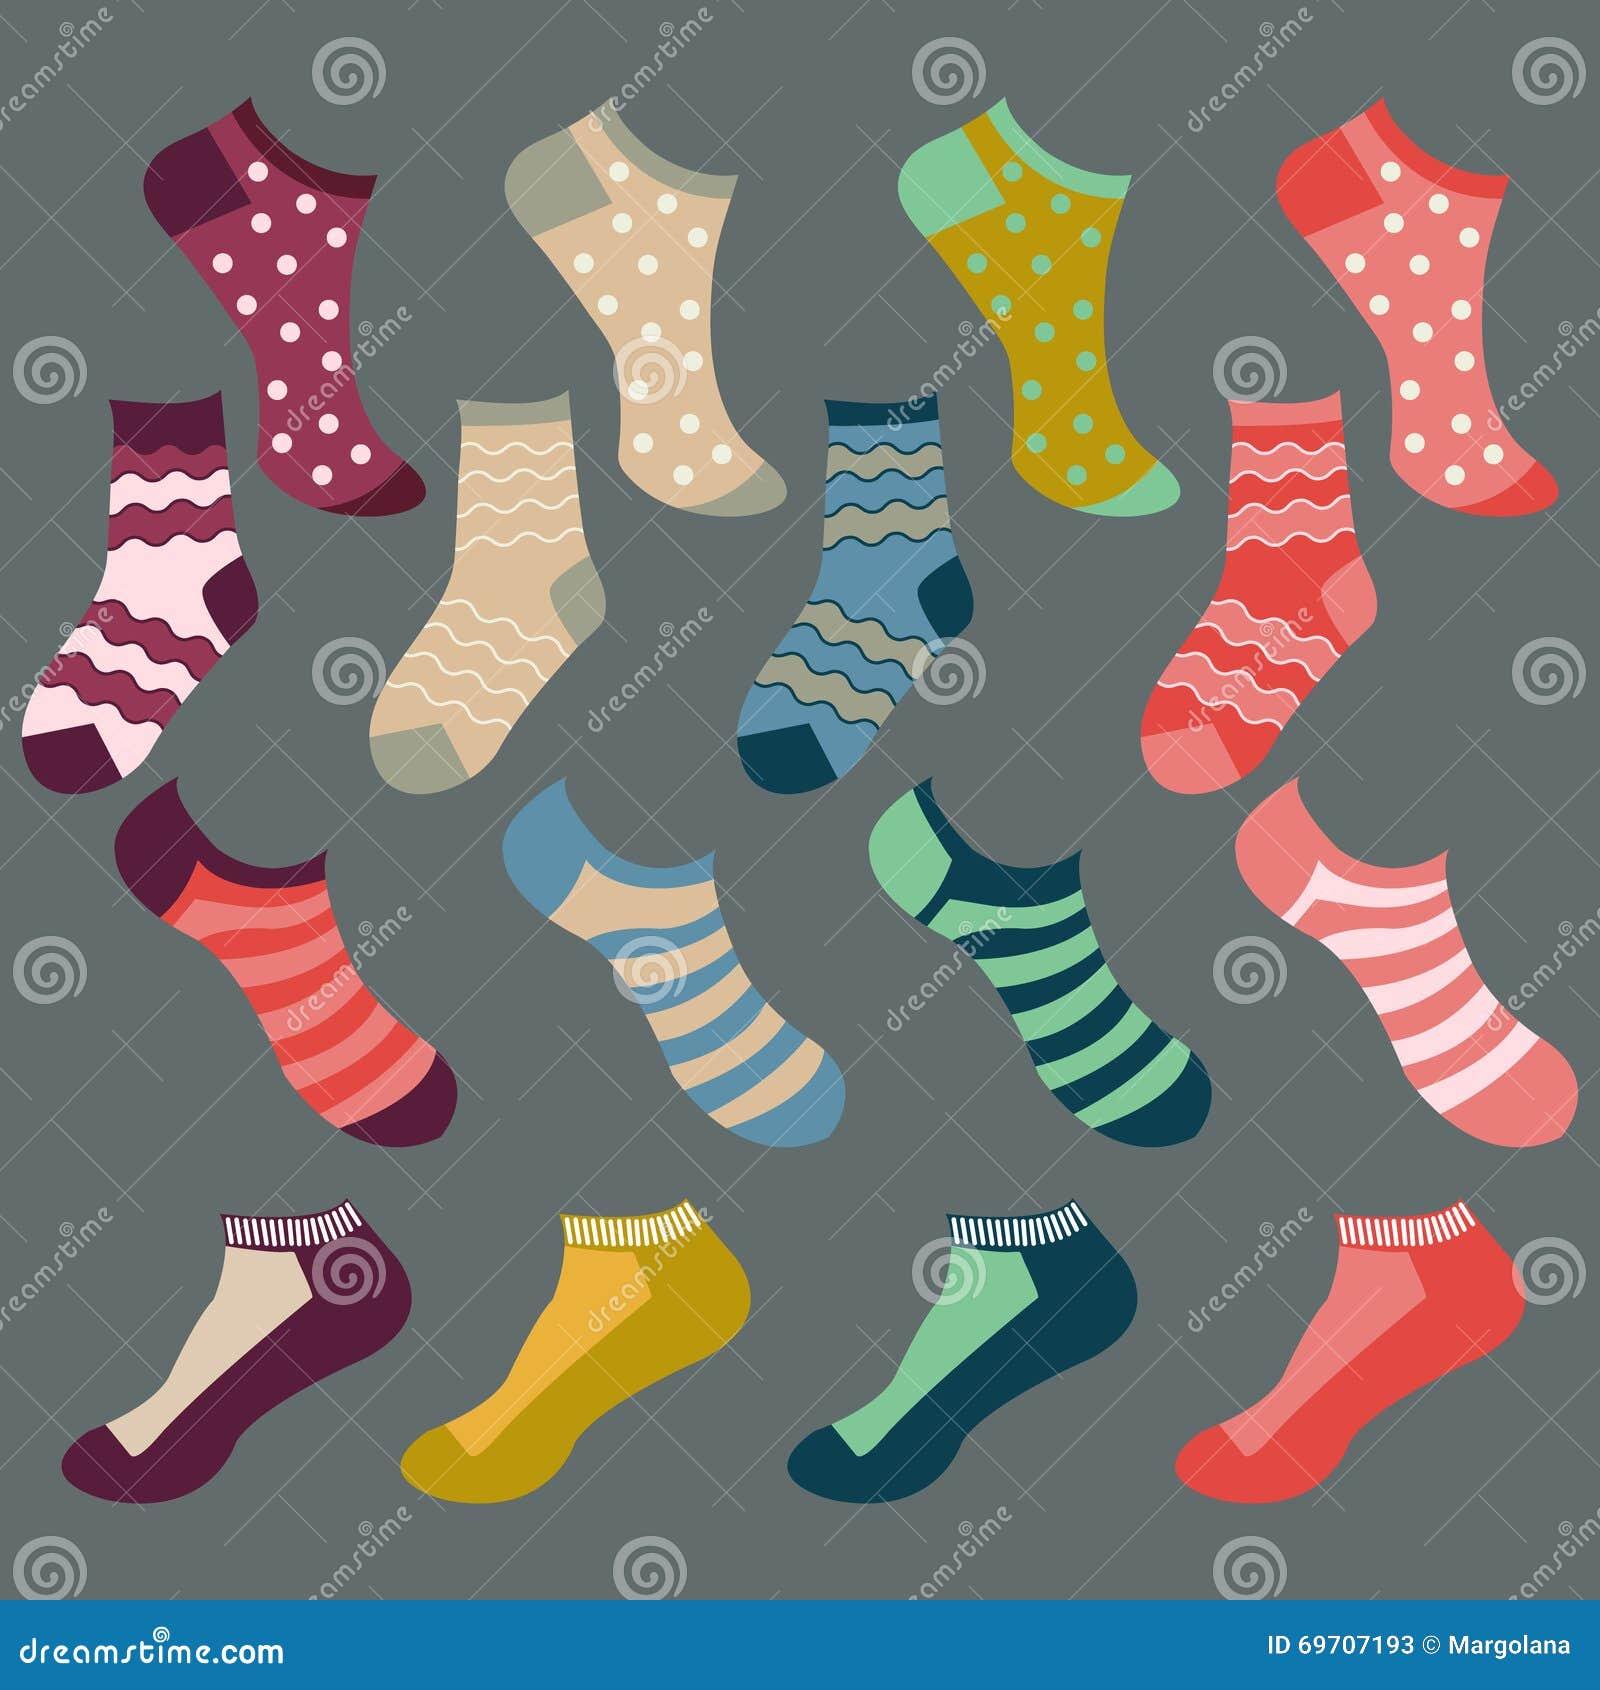 Different types of socks- Illustration Stock Photos - Types Of Socks Stock Illustration - Image: 75534167